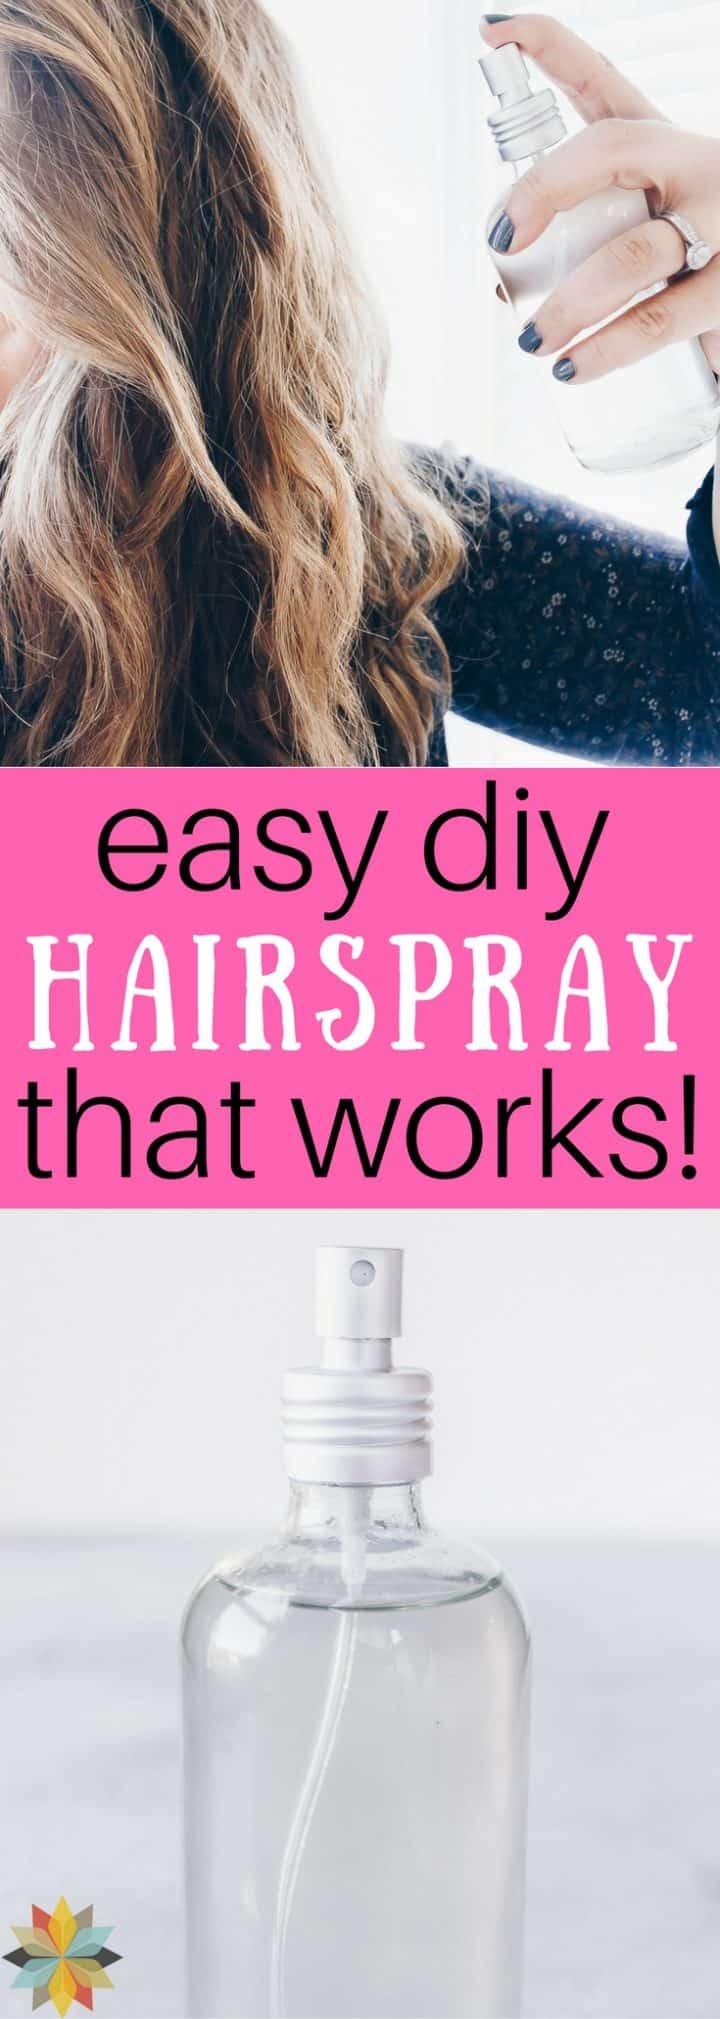 Easy Homemade Hairspray